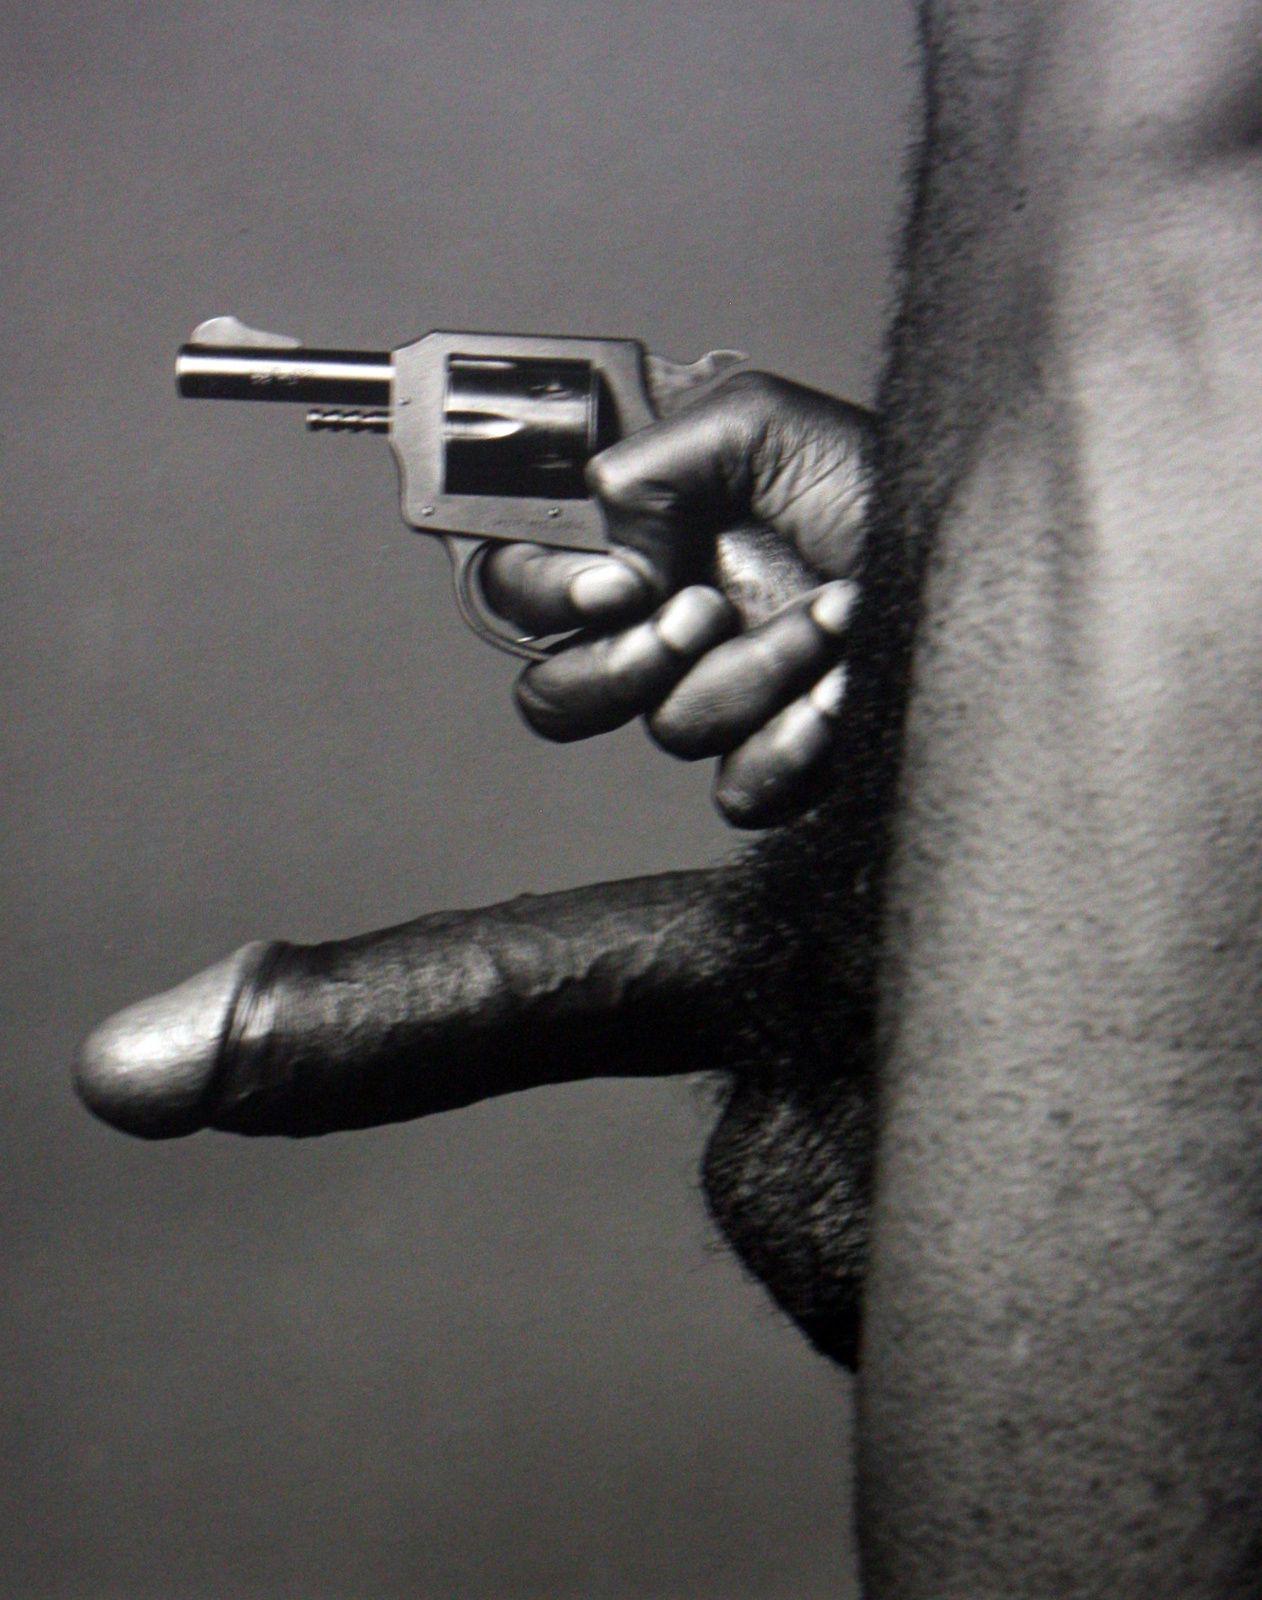 Cock and gun, 1982